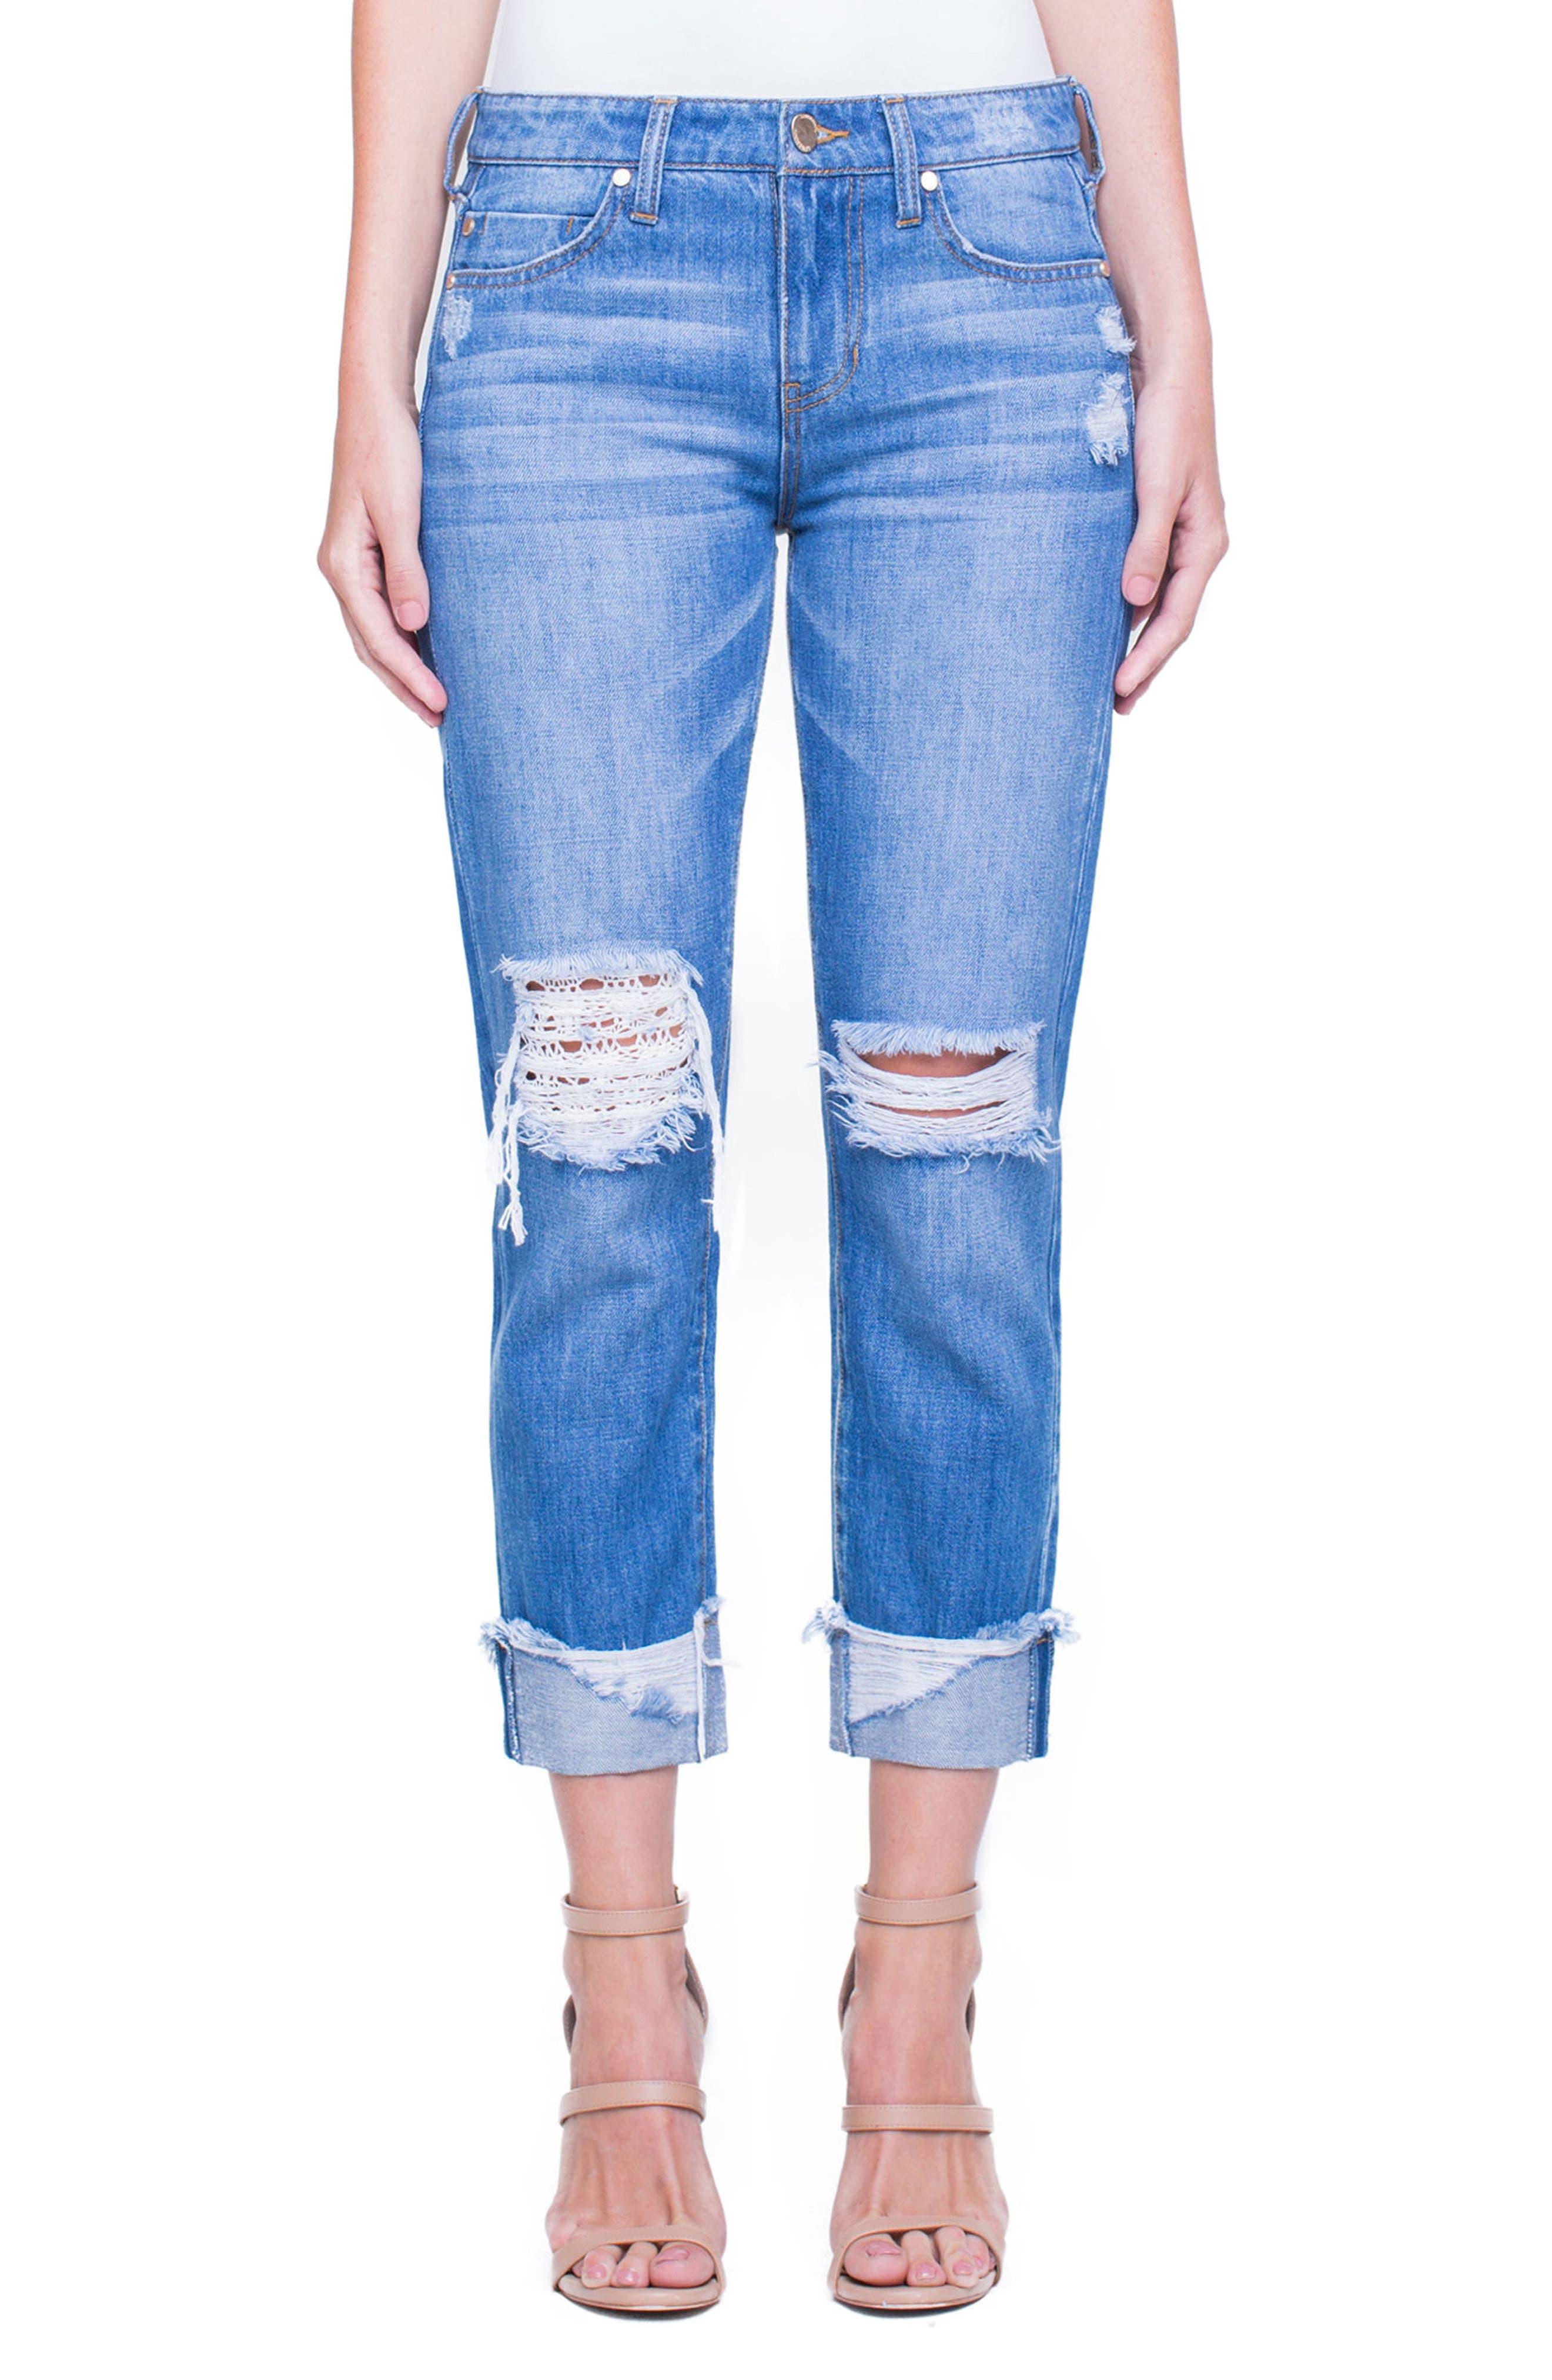 Jeans Company Kennedy Distressed Raw Hem Crop Boyfriend Jeans,                             Main thumbnail 1, color,                             402